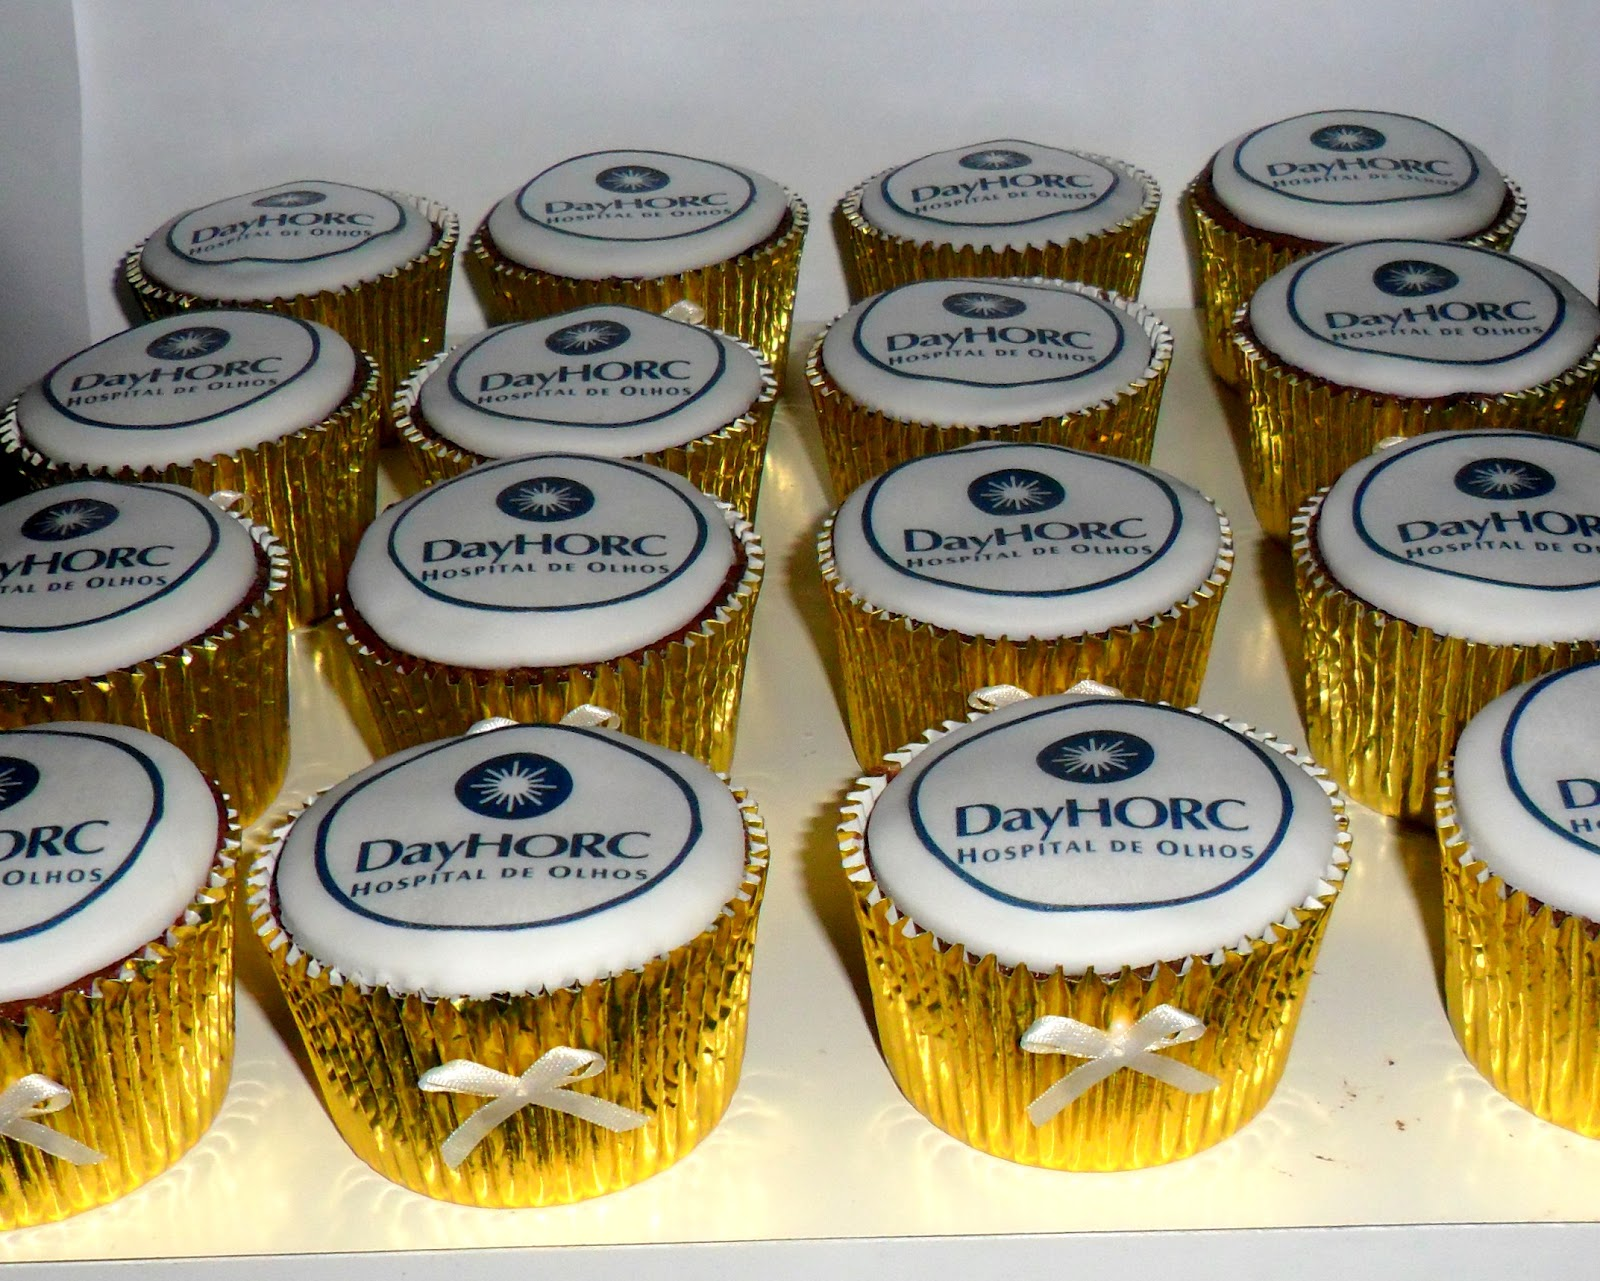 Cupcakes-Day-Horc-cupcakes--24-cupcake_usa_oprogramador